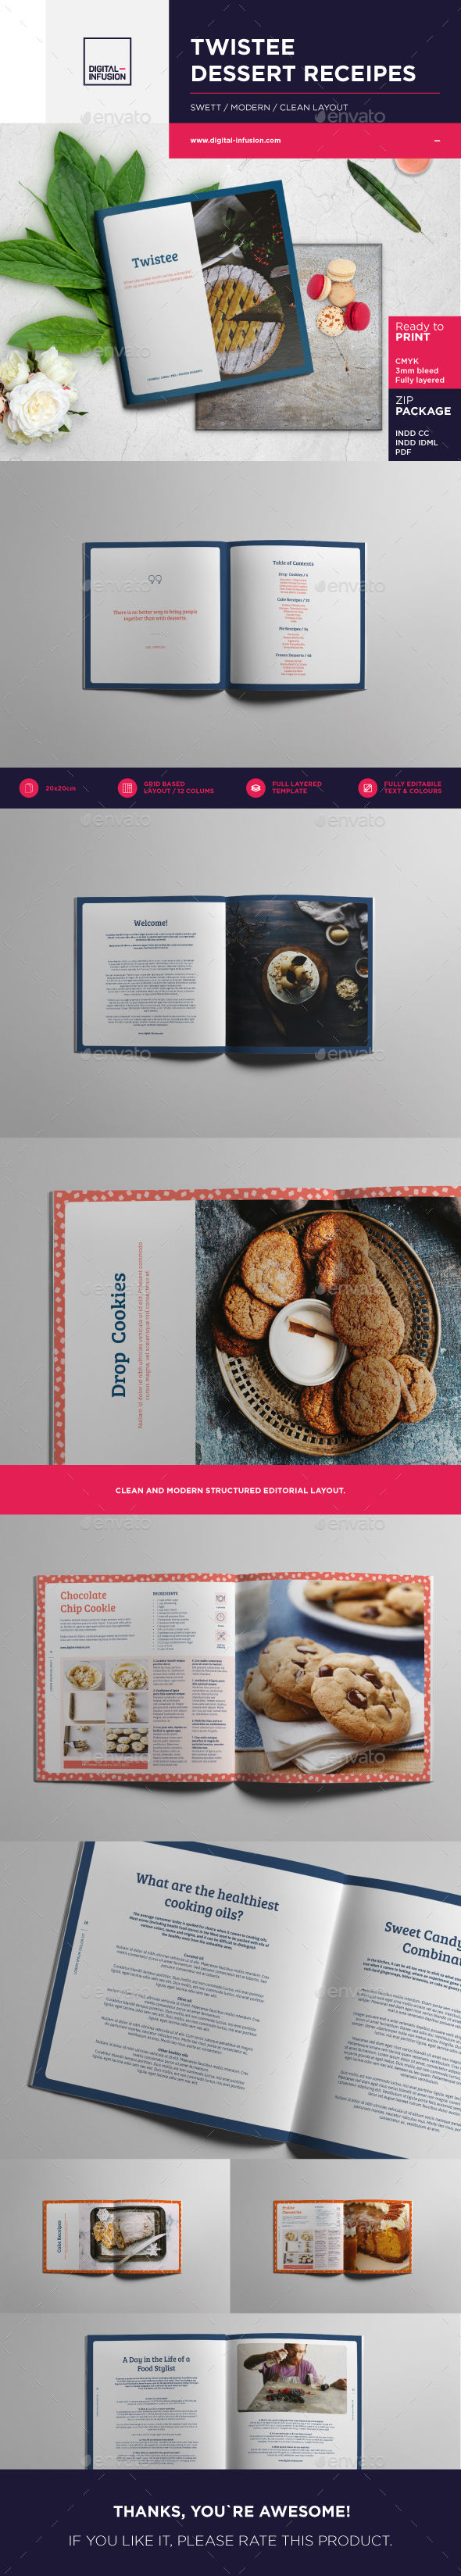 Twistee — Dessert Recipes Brochure - Catalogs Brochures